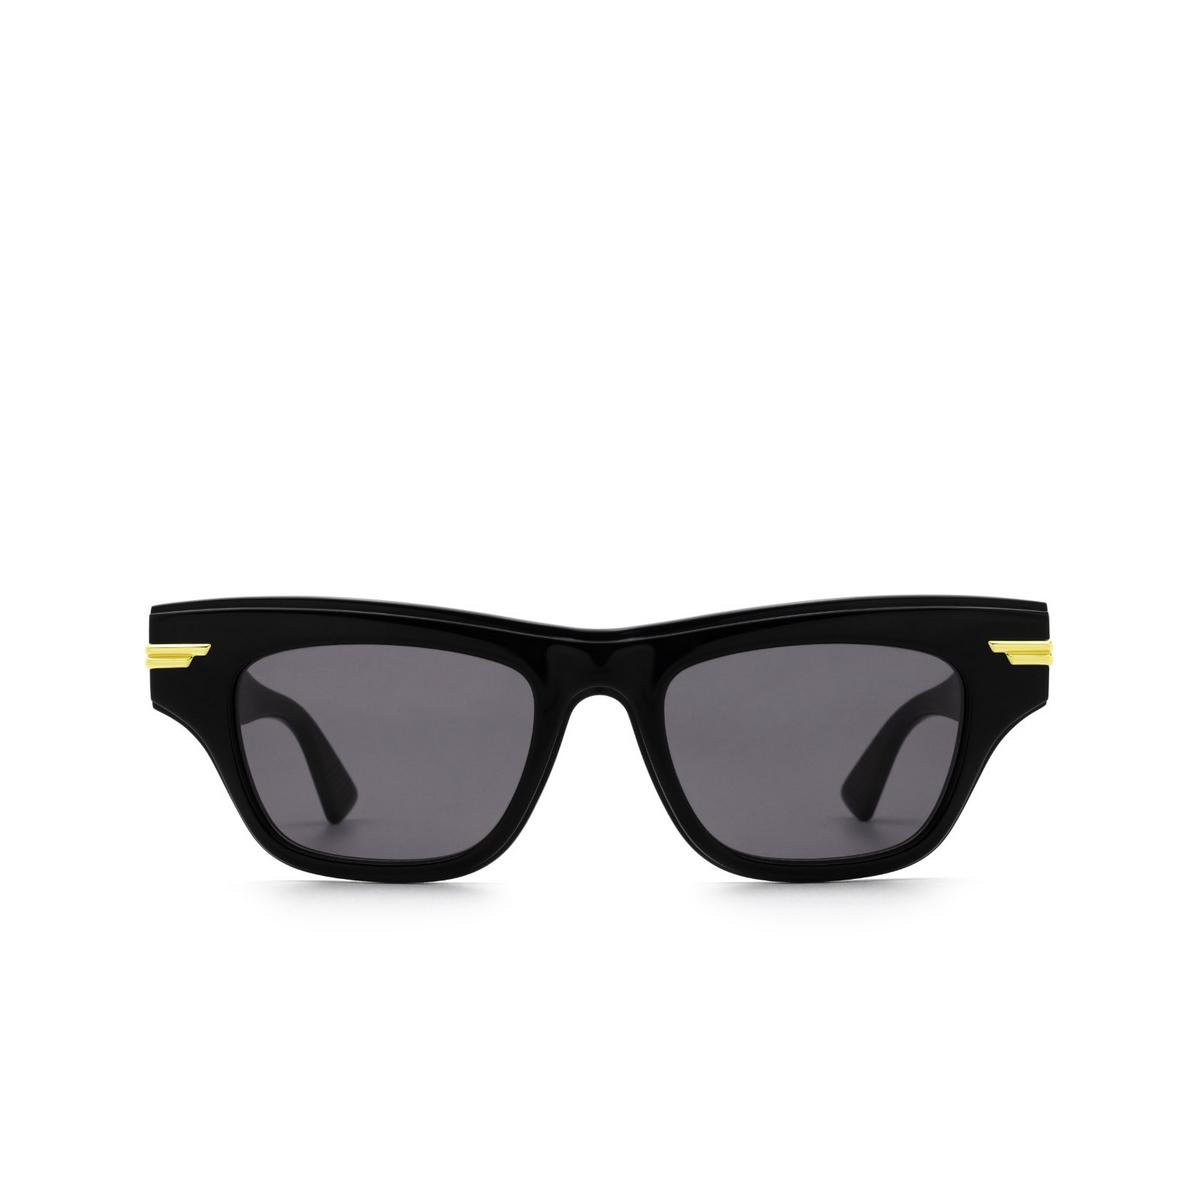 Bottega Veneta® Cat-eye Sunglasses: BV1122S color Black 001 - front view.